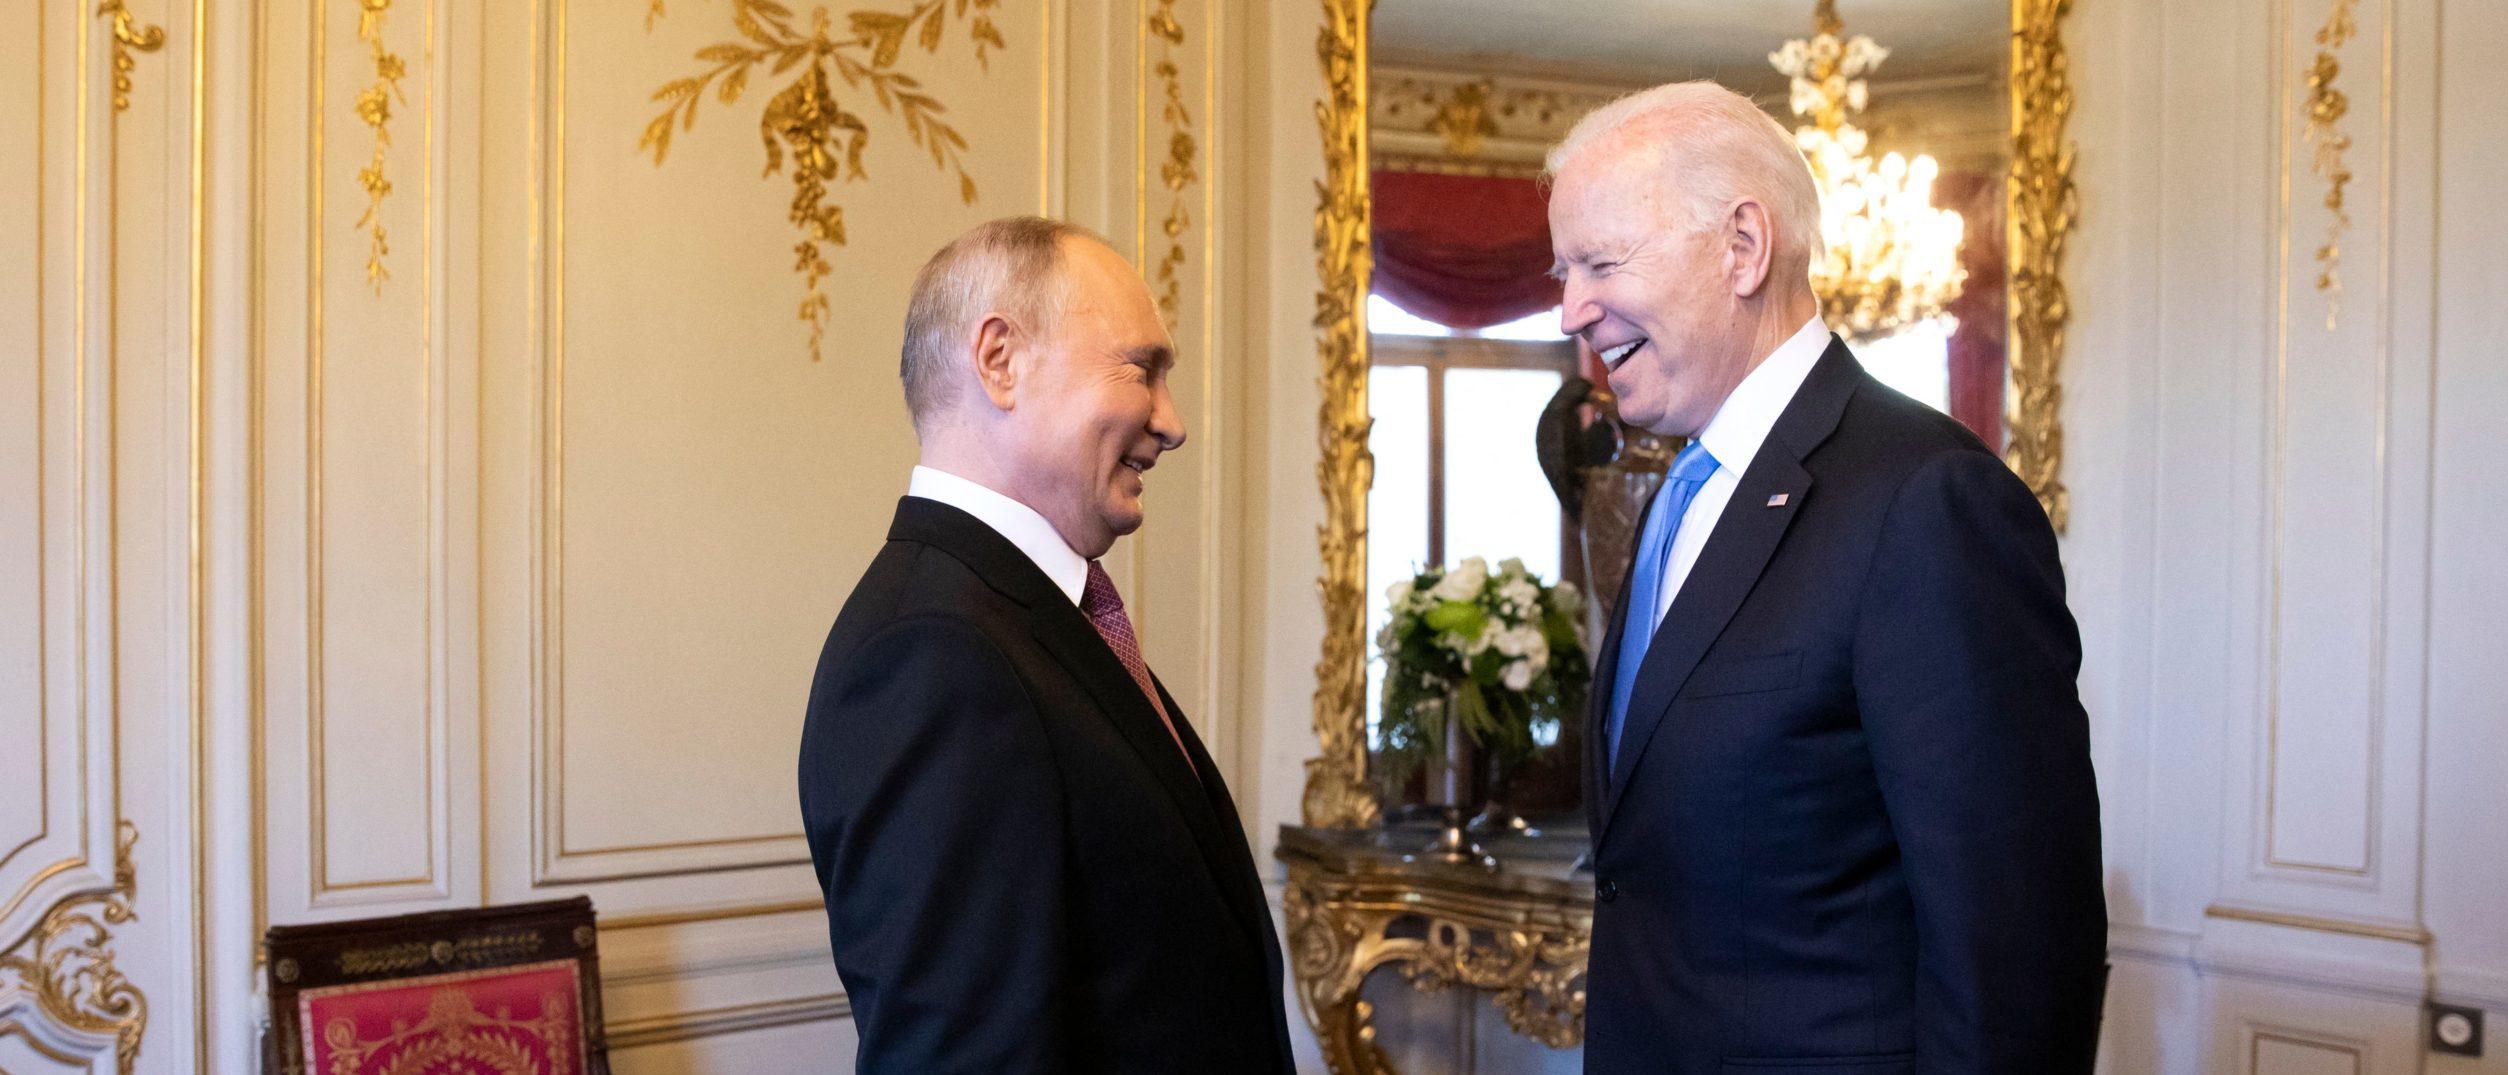 US President Joe Biden (R) talks to Russian President Vladimir Putin prior to the US-Russia summit at the Villa La Grange, in Geneva on June 16, 2021. (Photo by PETER KLAUNZER / POOL / AFP) (Photo by PETER KLAUNZER/POOL/AFP via Getty Images)